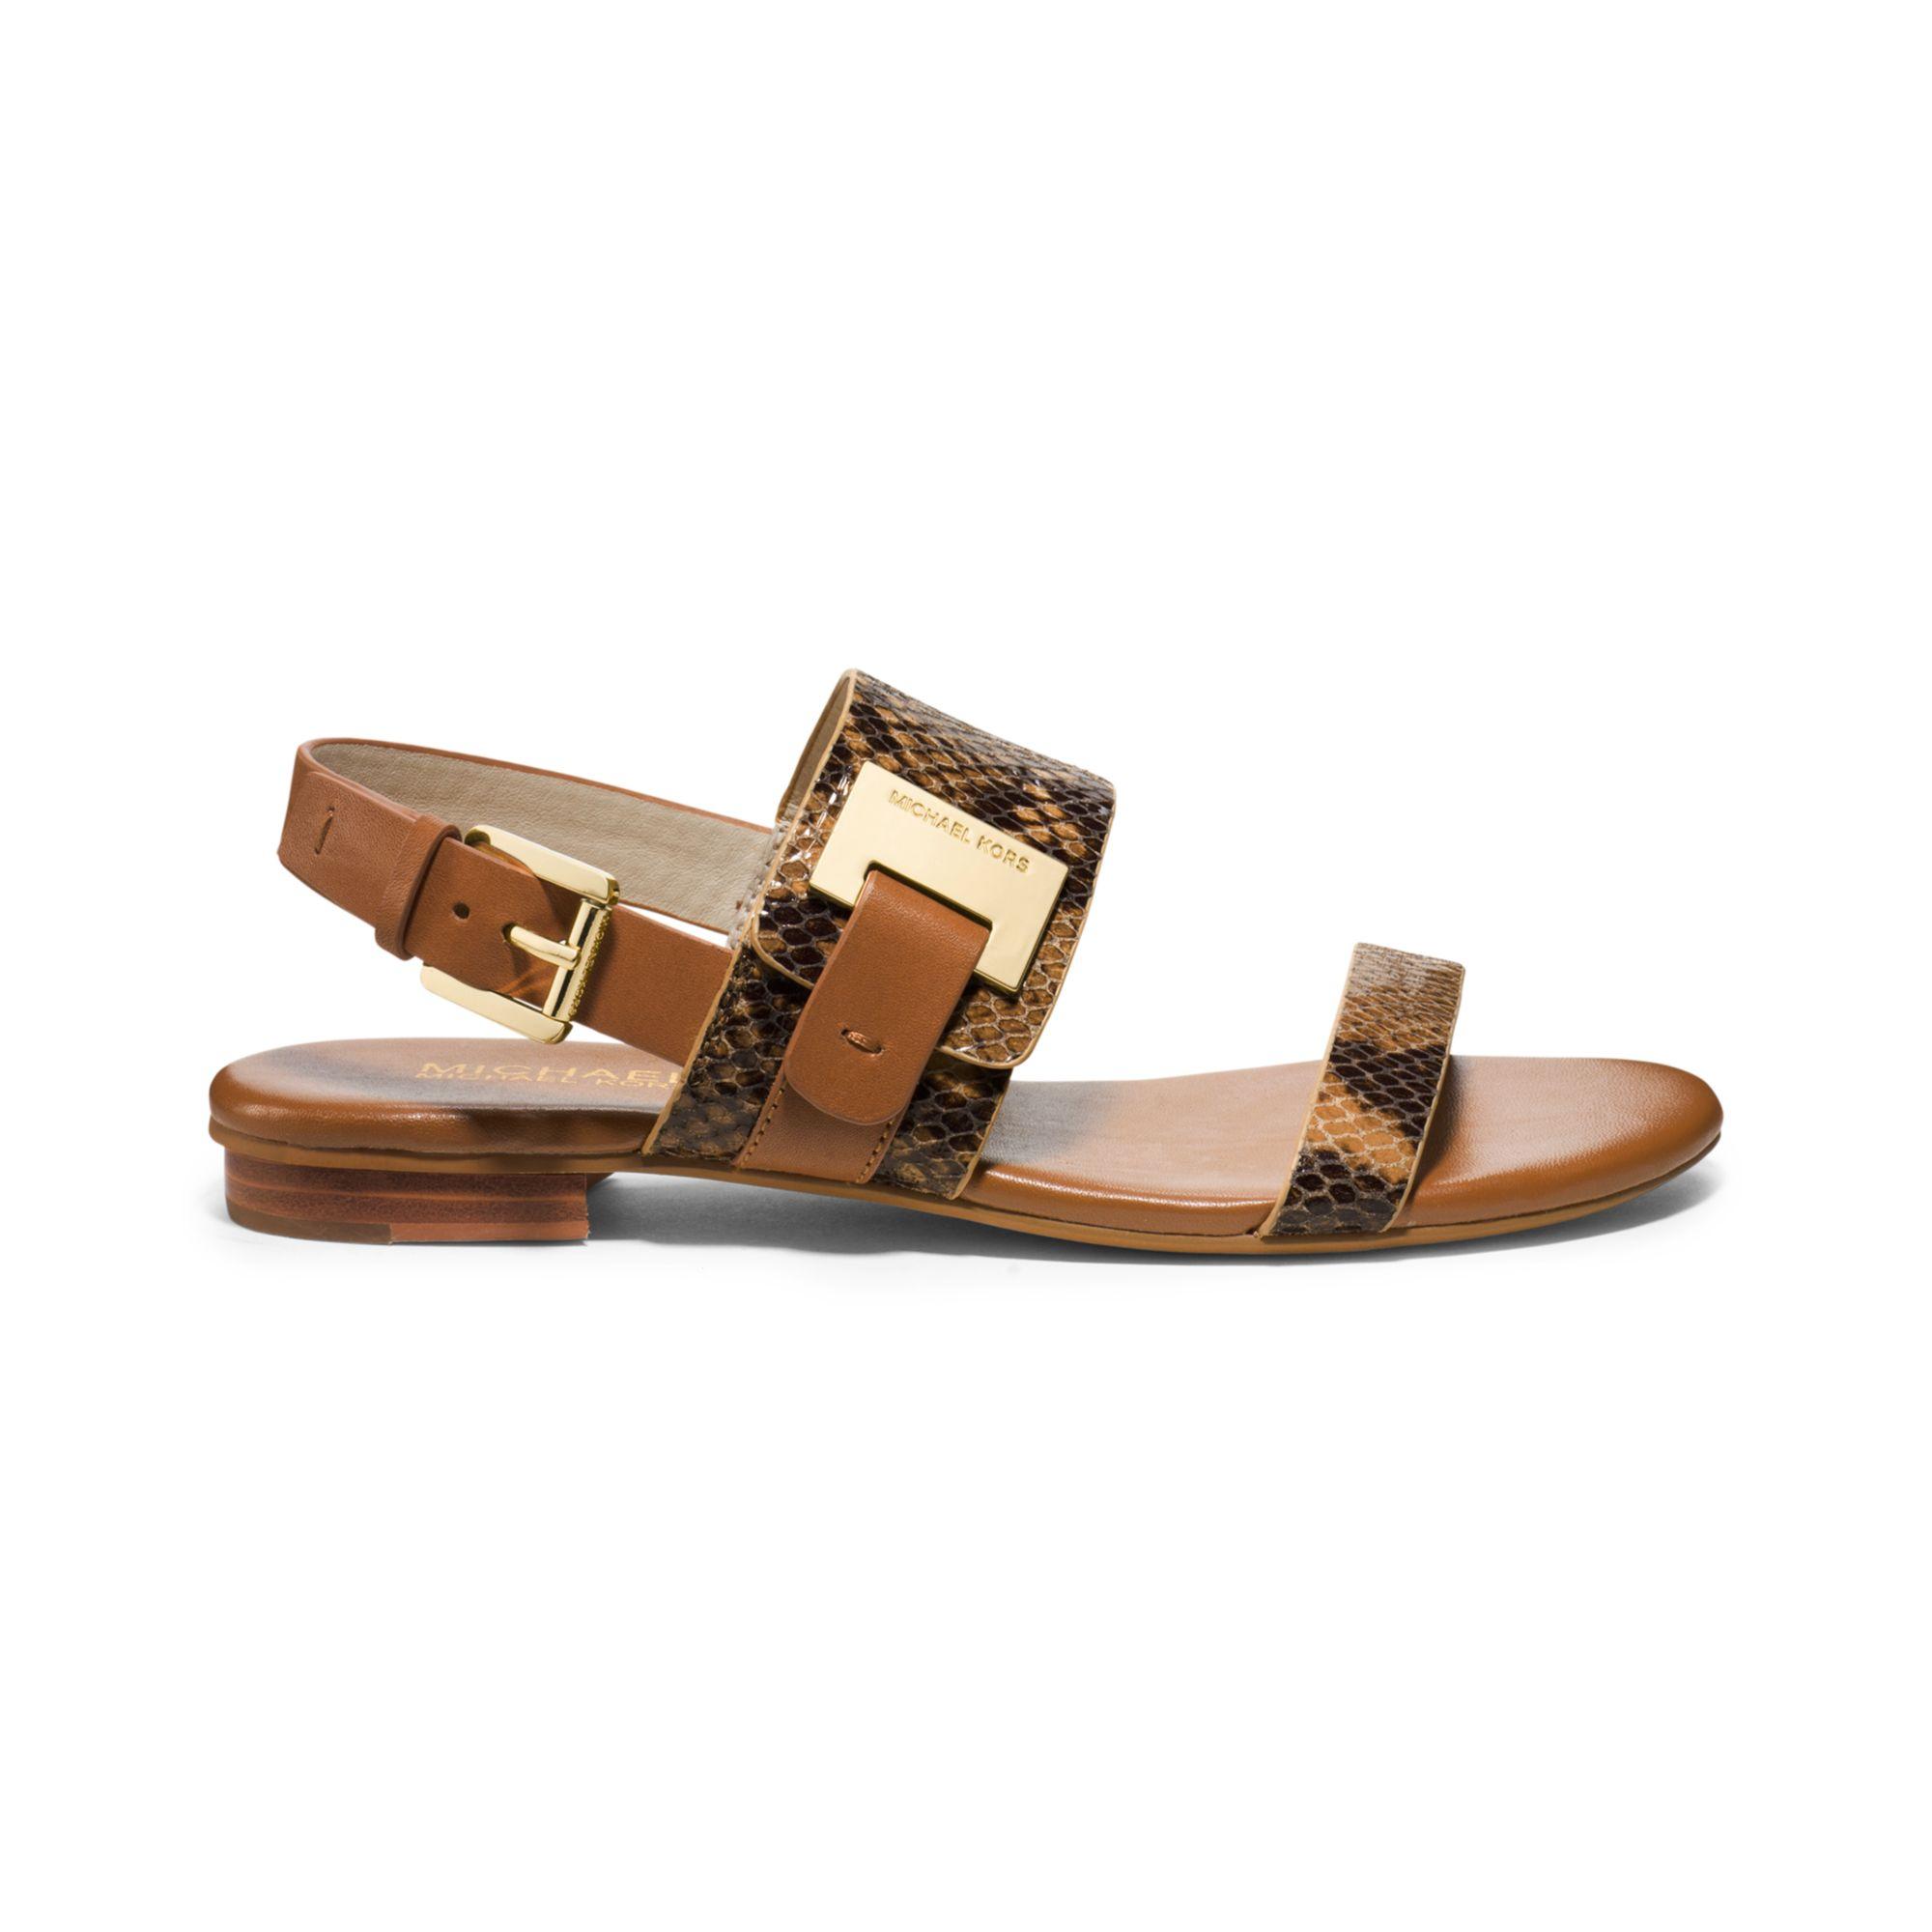 Michael Kors outlet -50% - White woman Sandals € 88